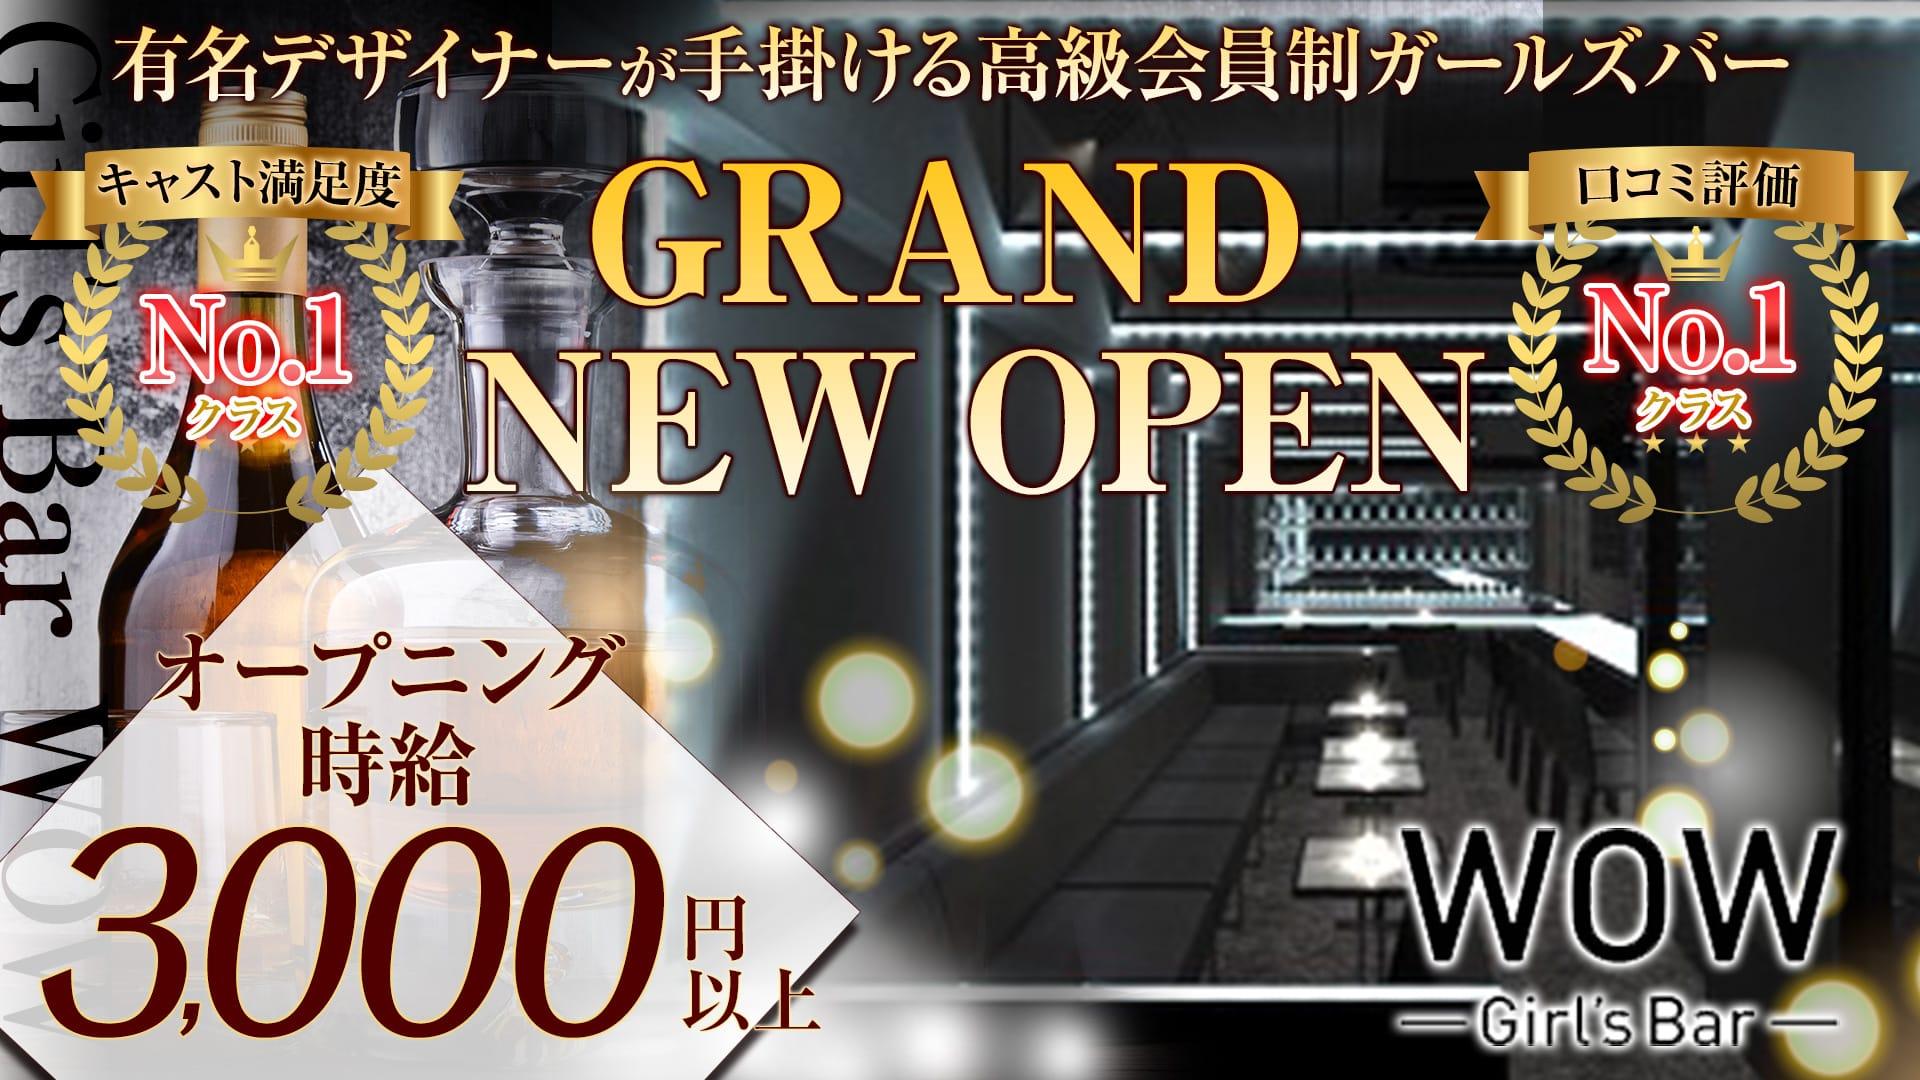 Girl's Bar WOW(ワオ) 錦糸町ガールズバー TOP画像